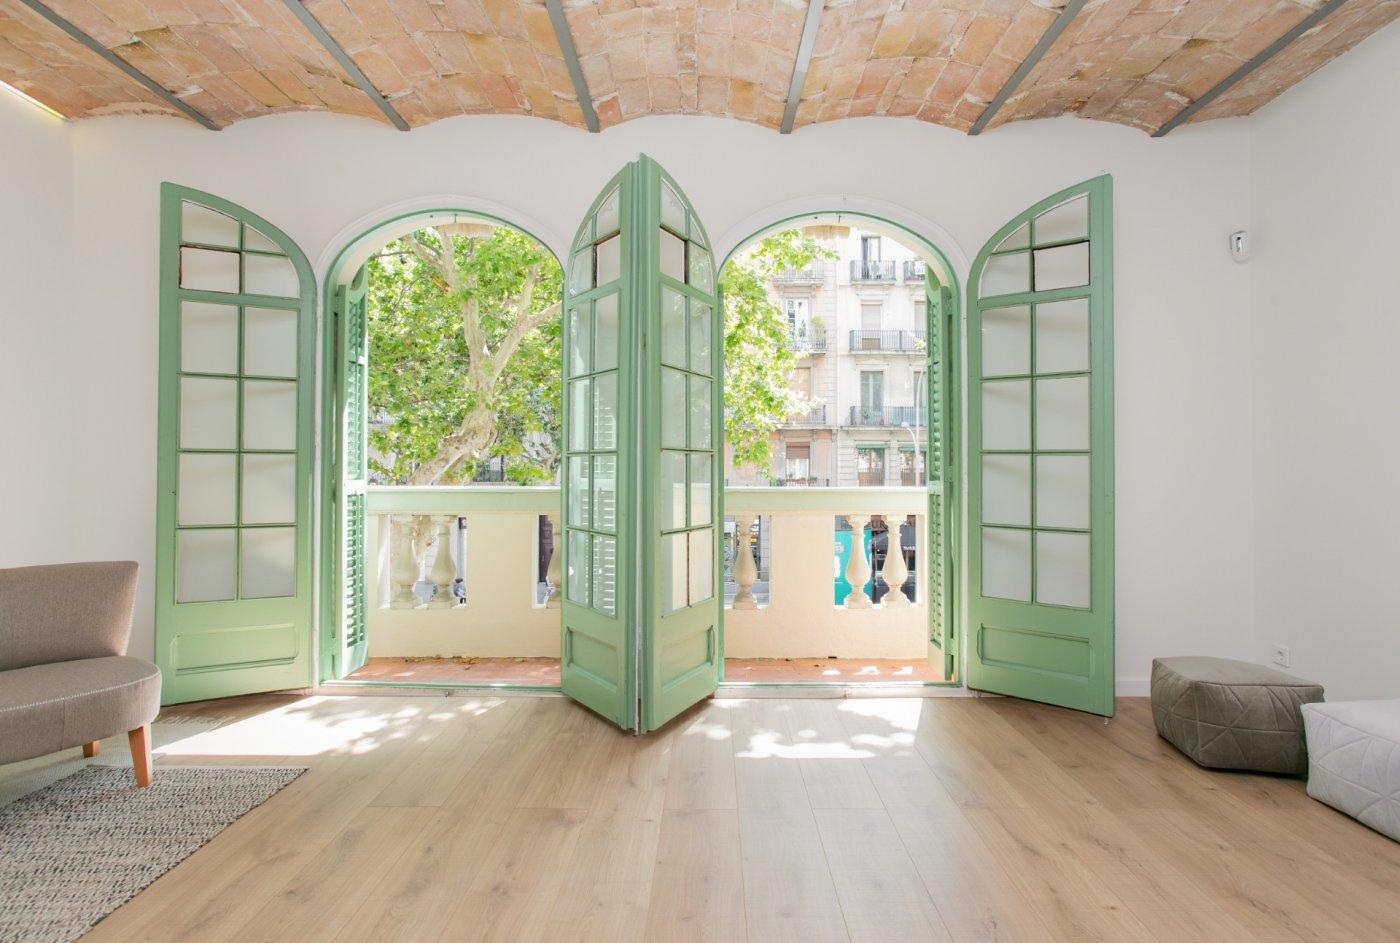 Piso rehabilitado integramente  en Zona Sant Antoni de Barcelona